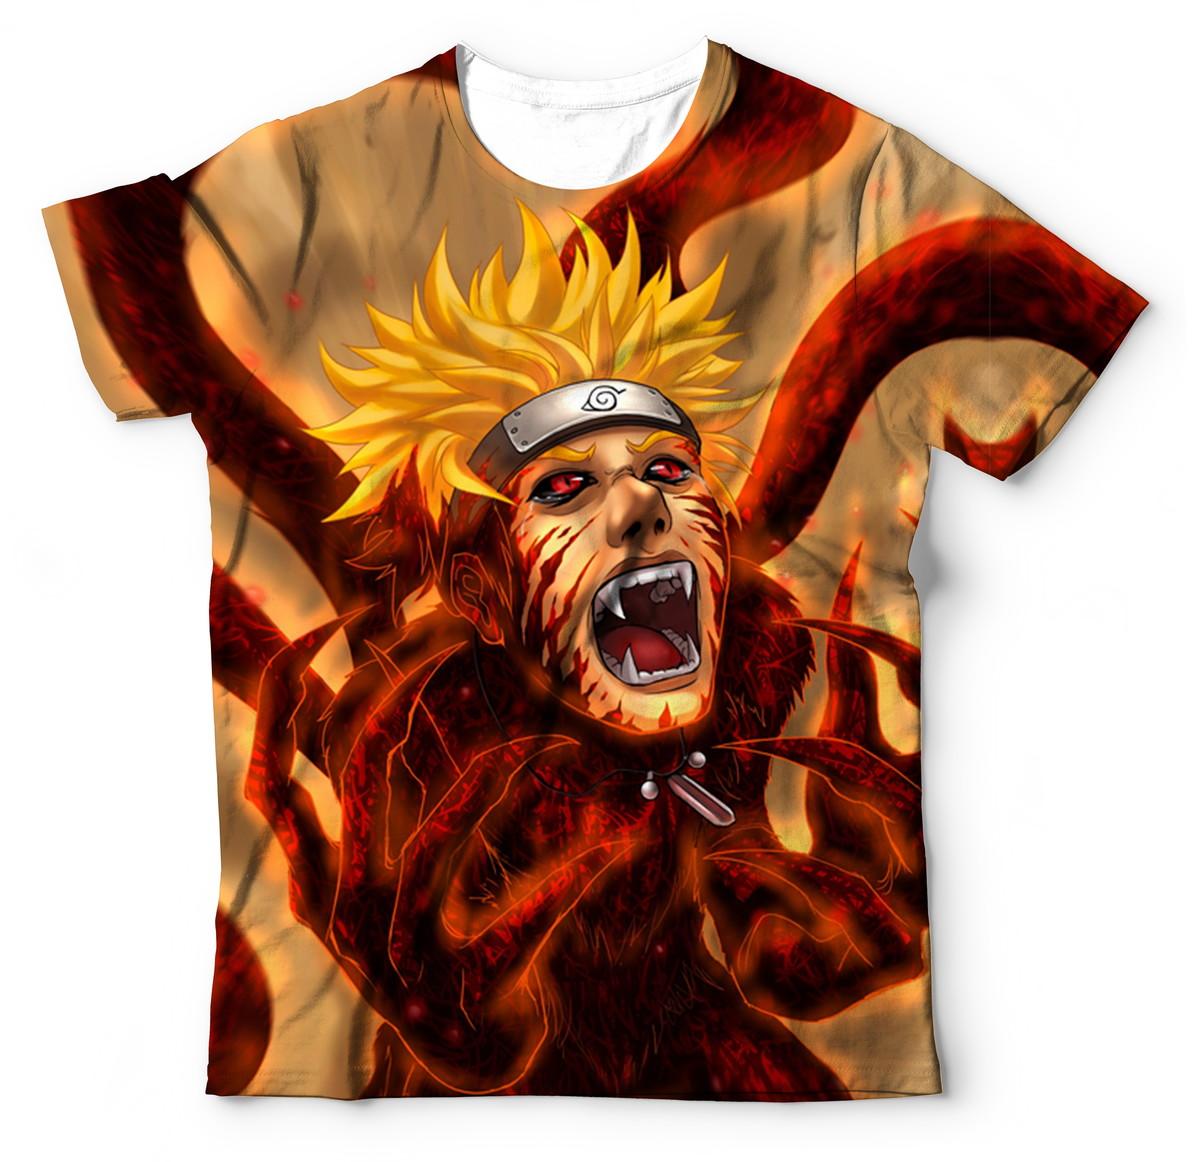 fab4ed543 Camisa Camiseta do Naruto shippuden Manga Curta no Elo7